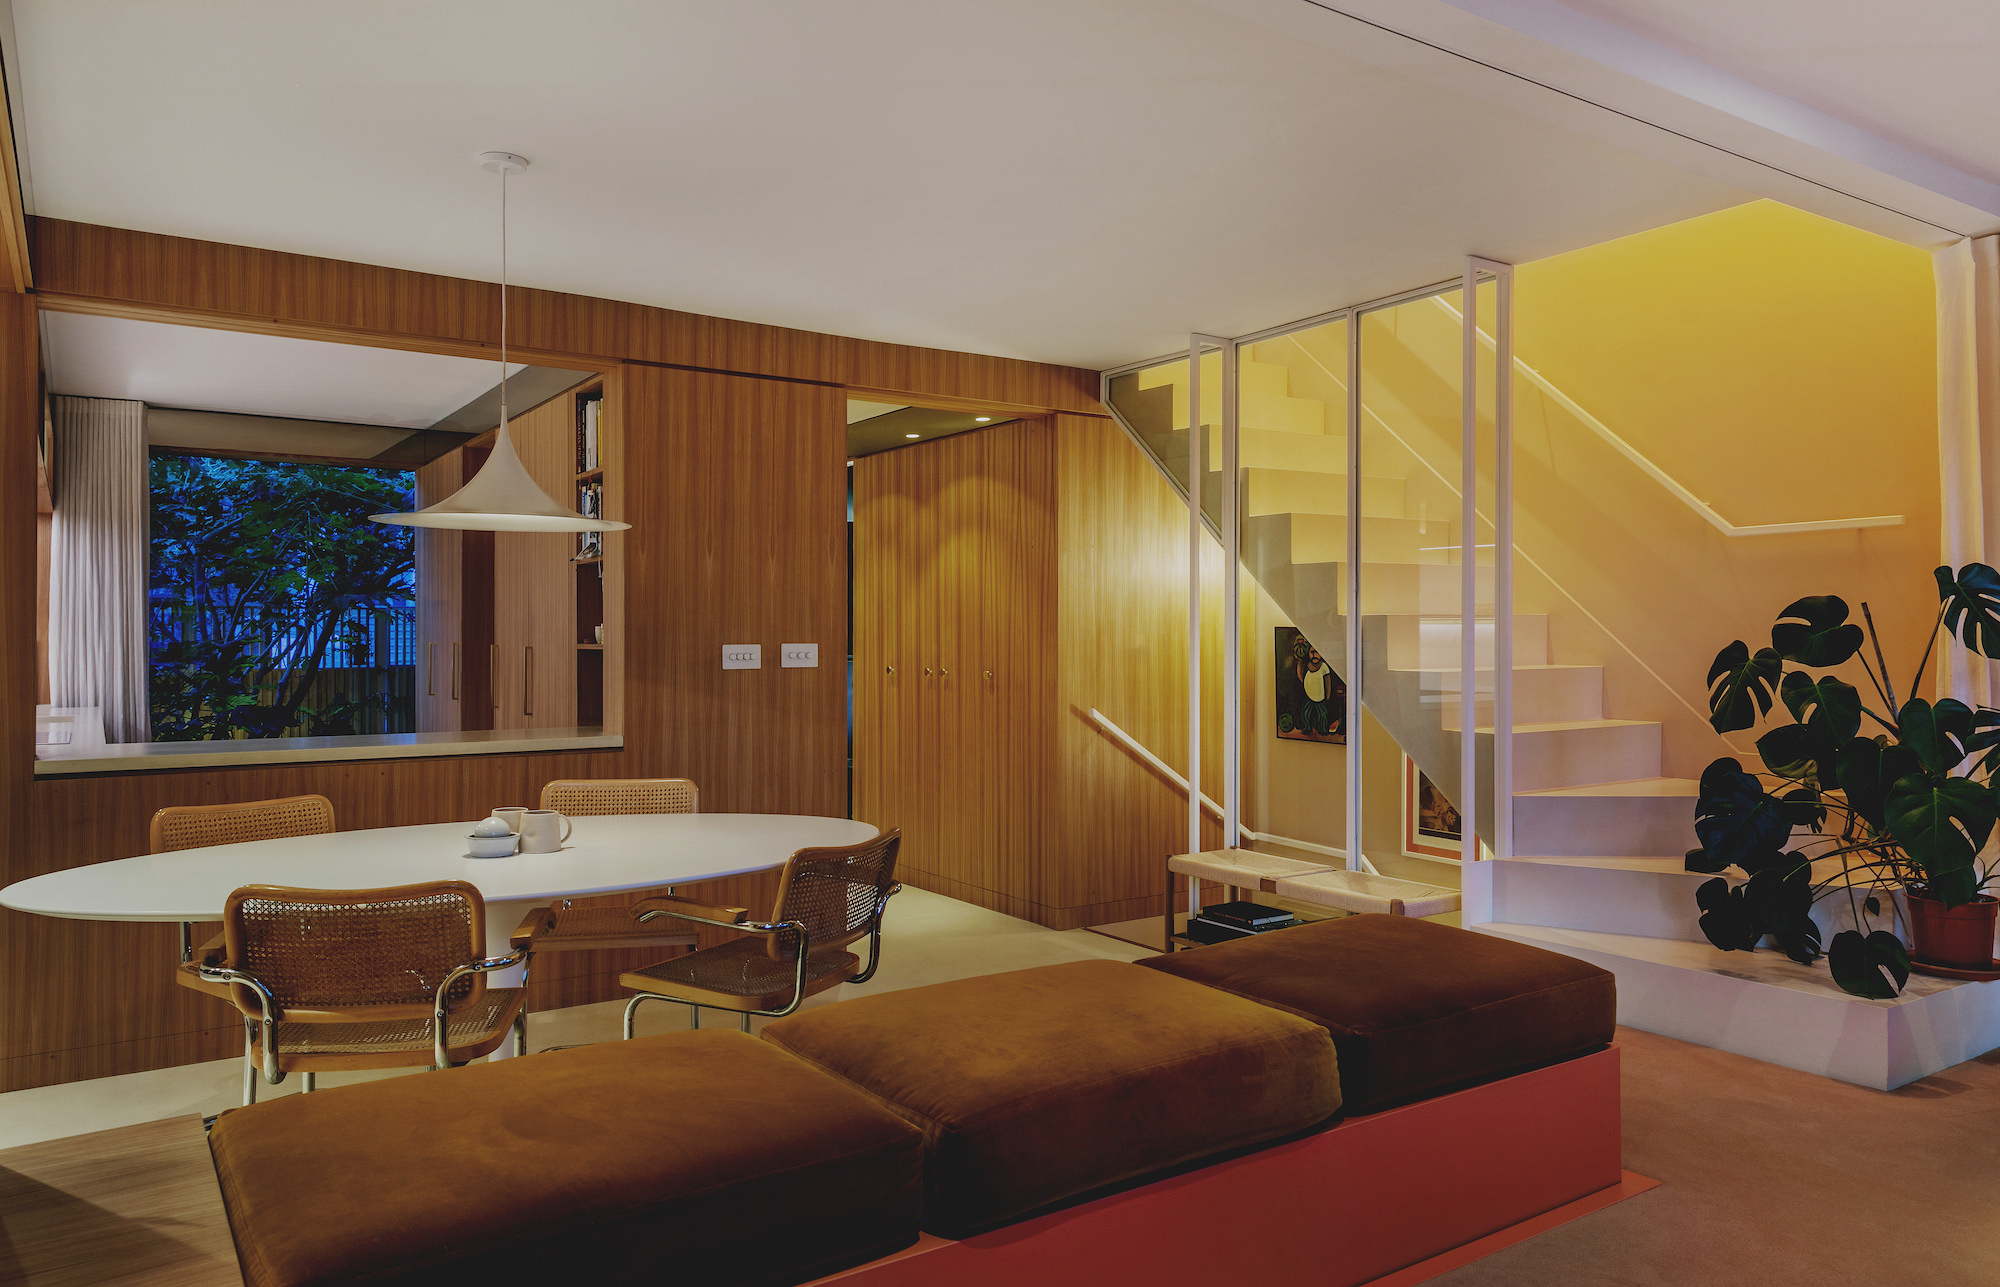 Studio Hagen Canyon House Hall Photo Mariell Lind Hansen Yellowtrace 34